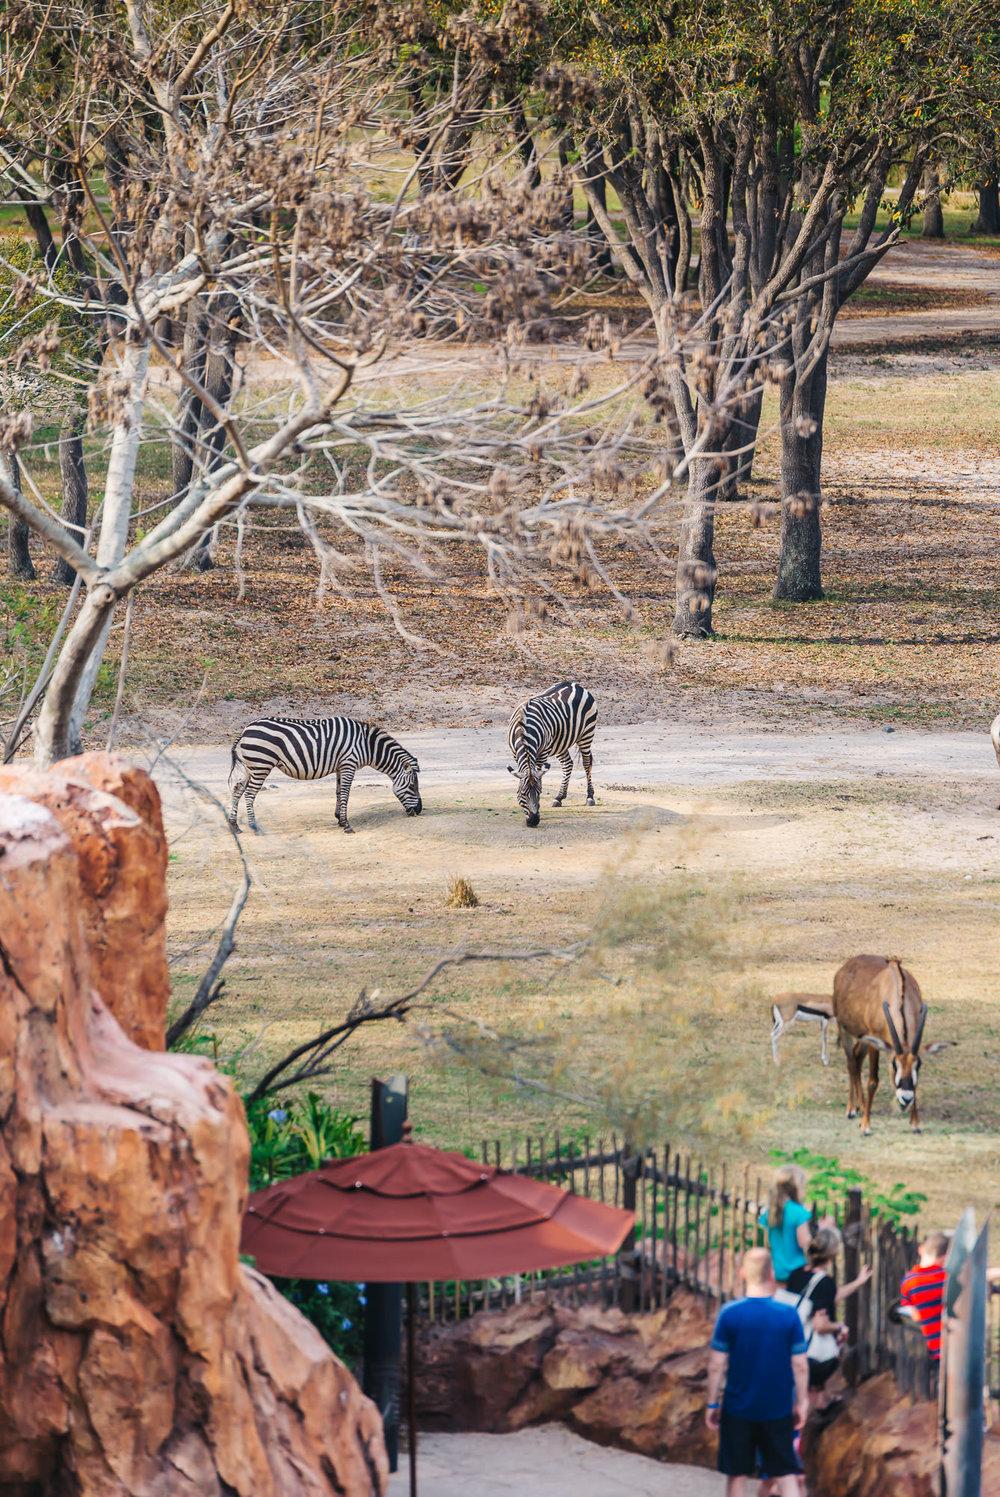 Safari Animals at the Lodge